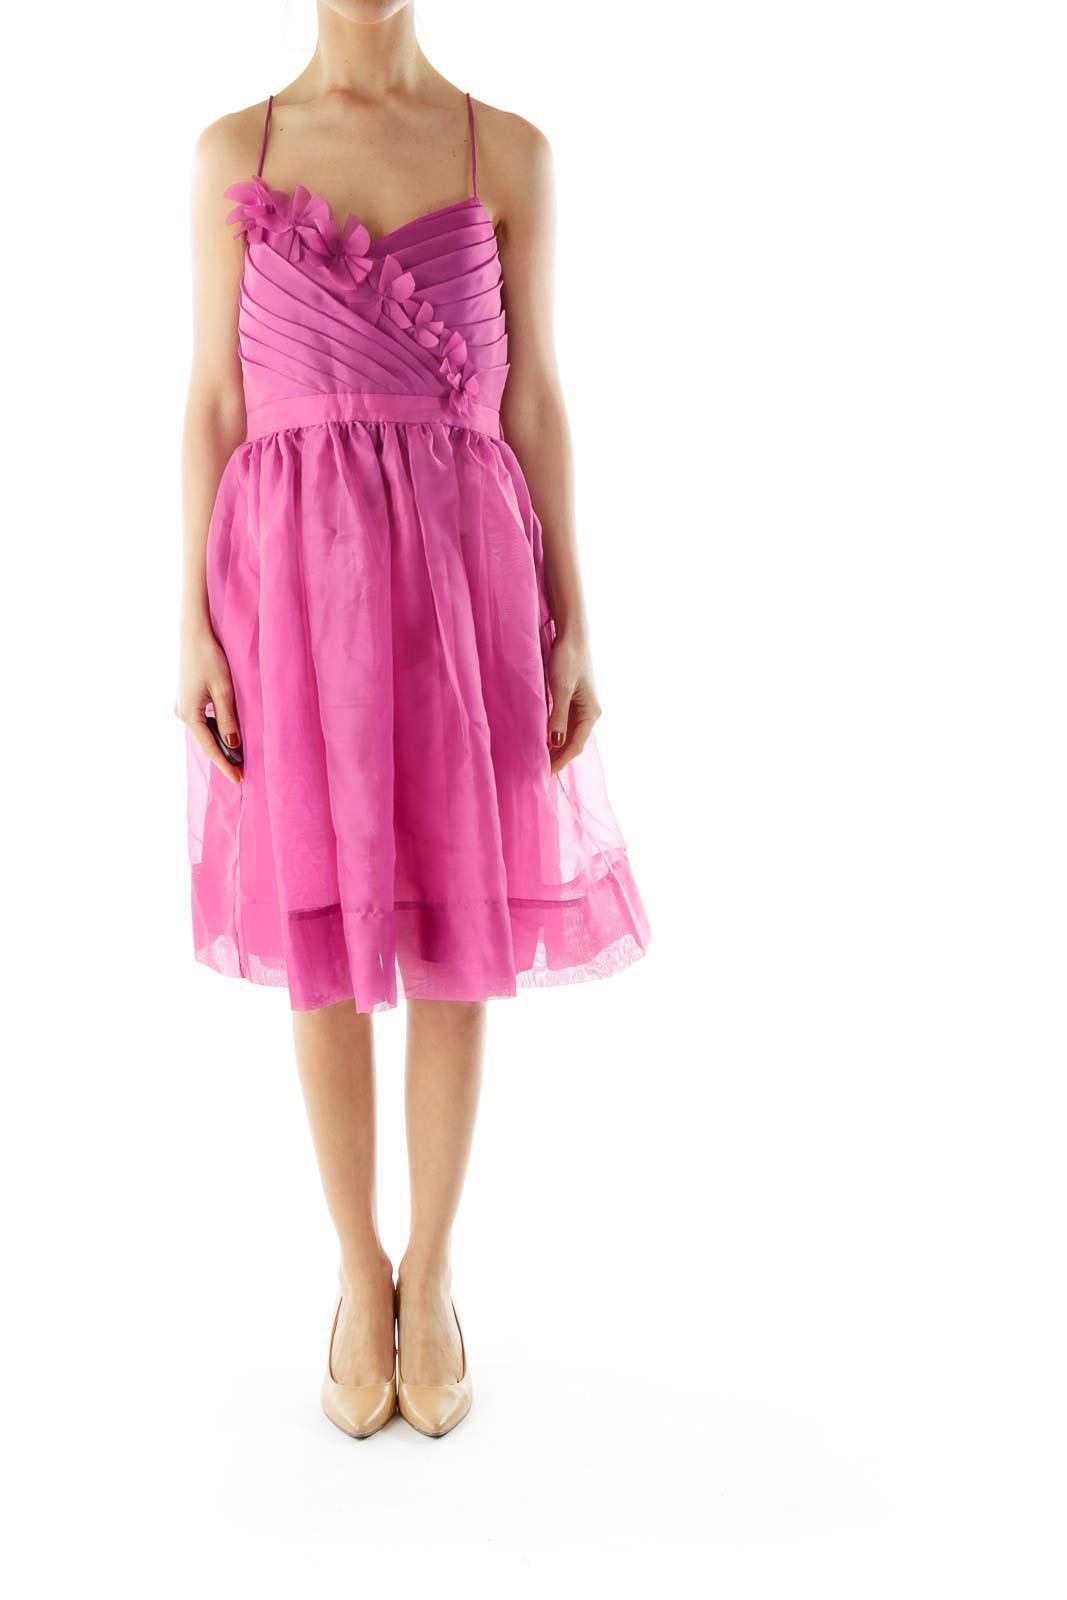 Purple A-Line Slip Cocktail Dress